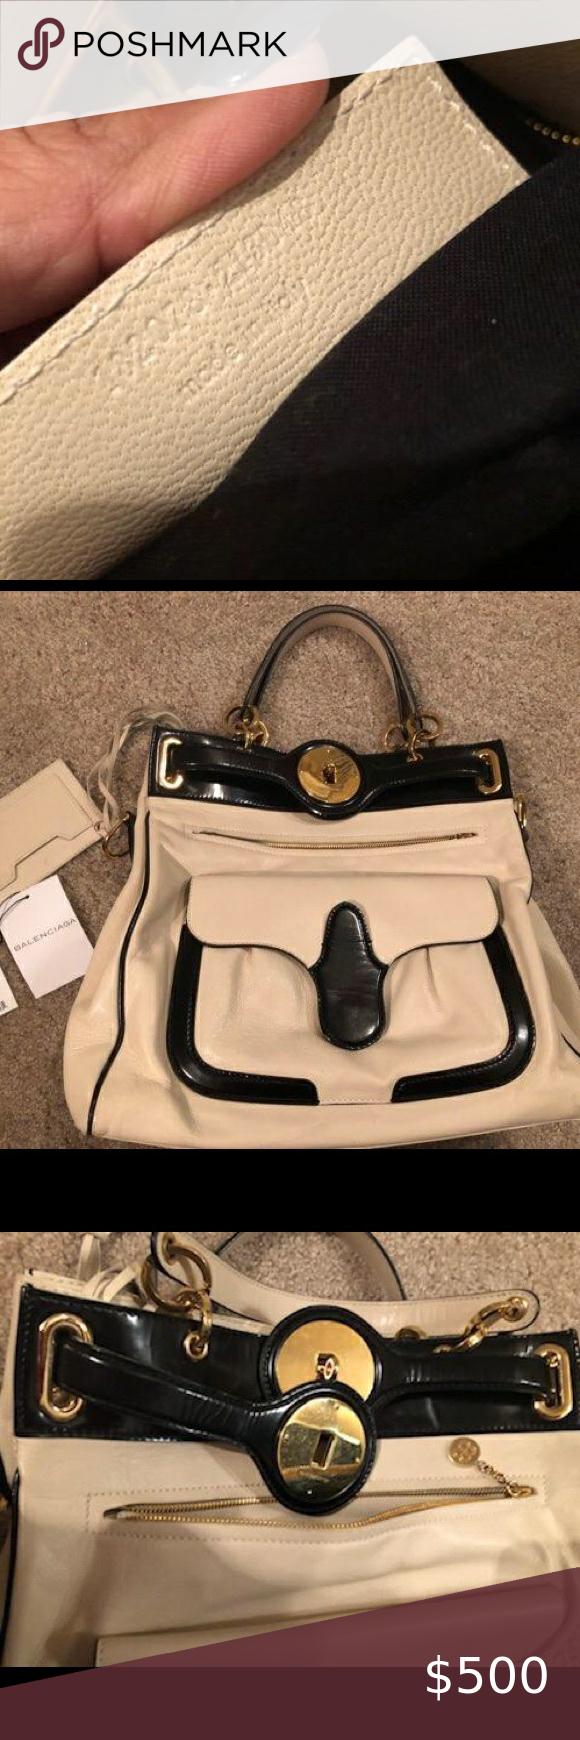 Womens tote bags, Balenciaga bag